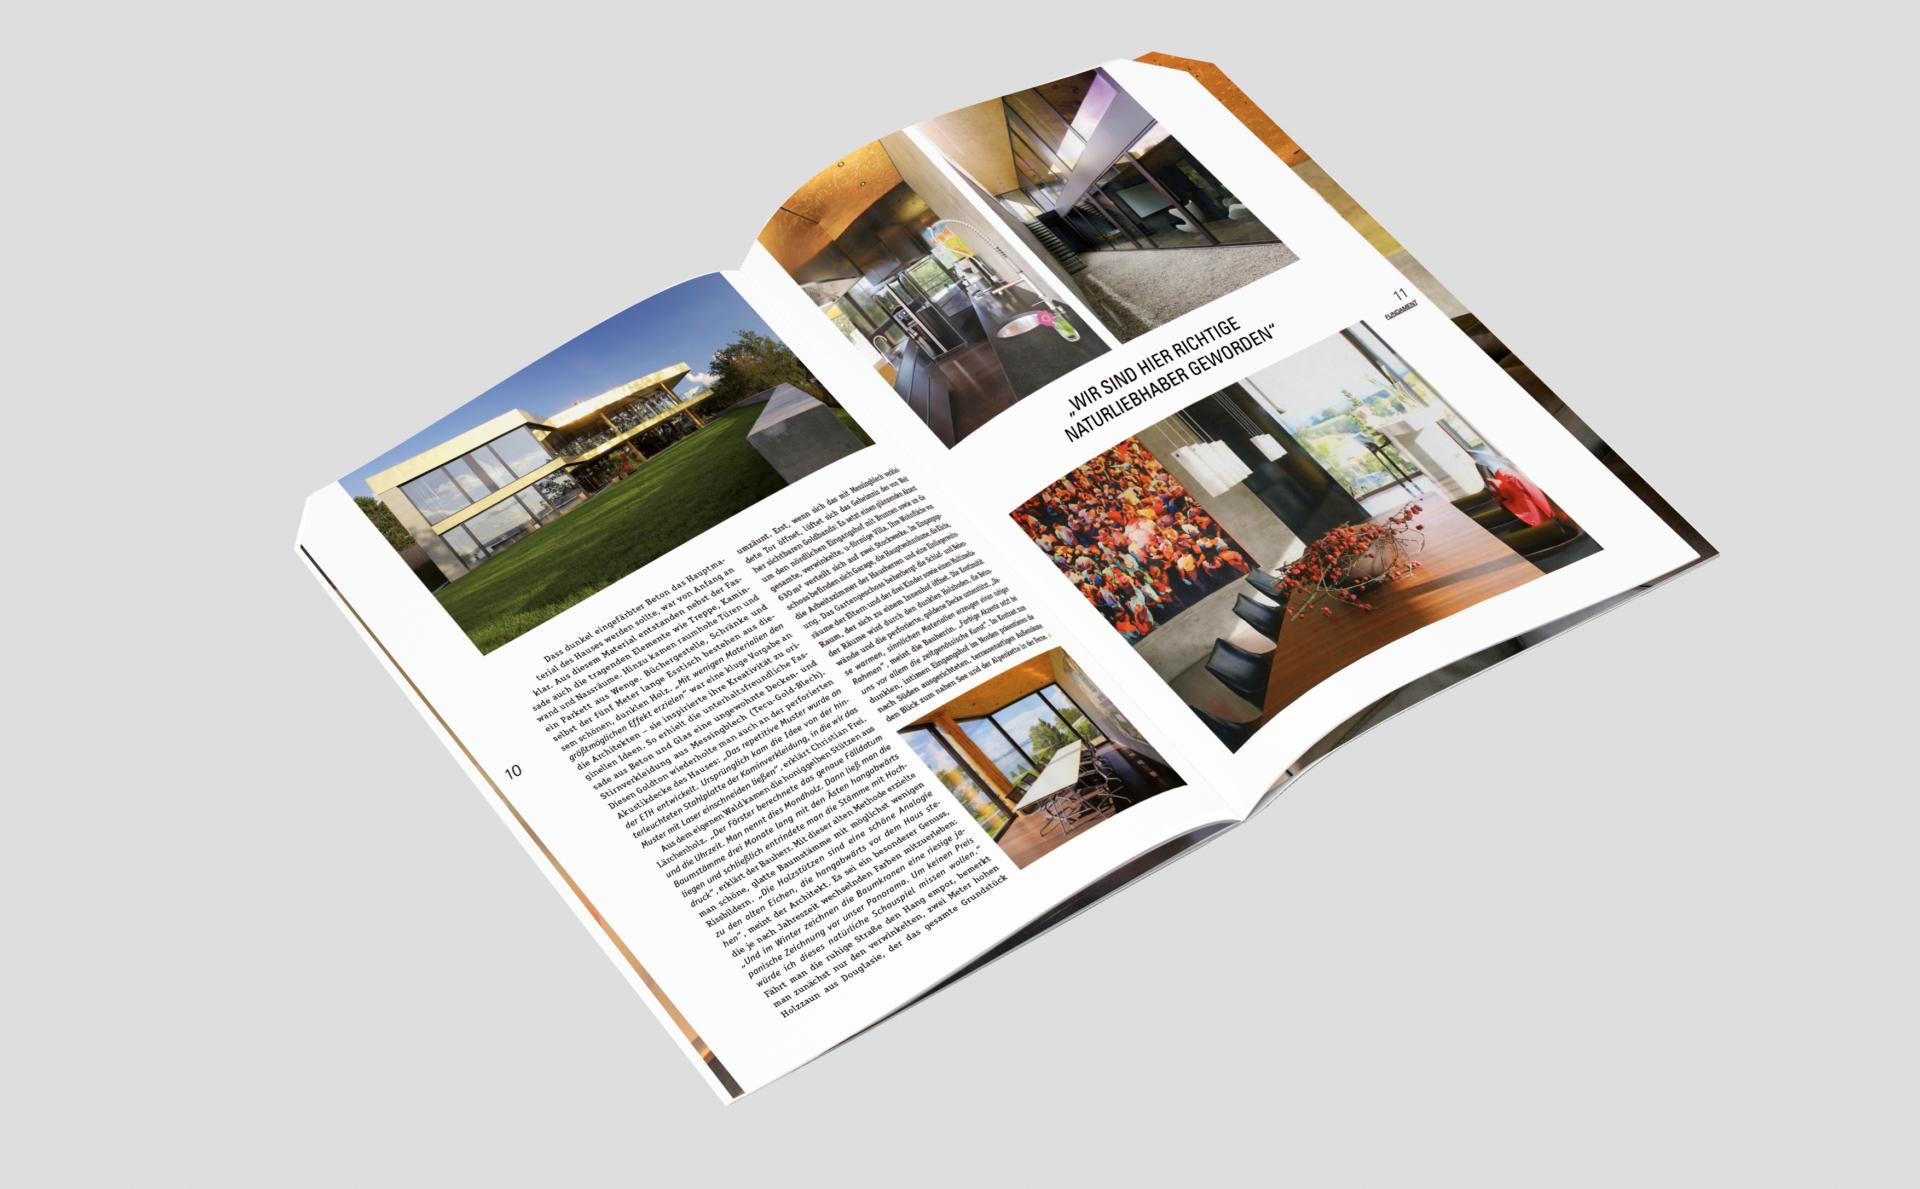 meandsarah – Grafikdesign Editorial: Fundament